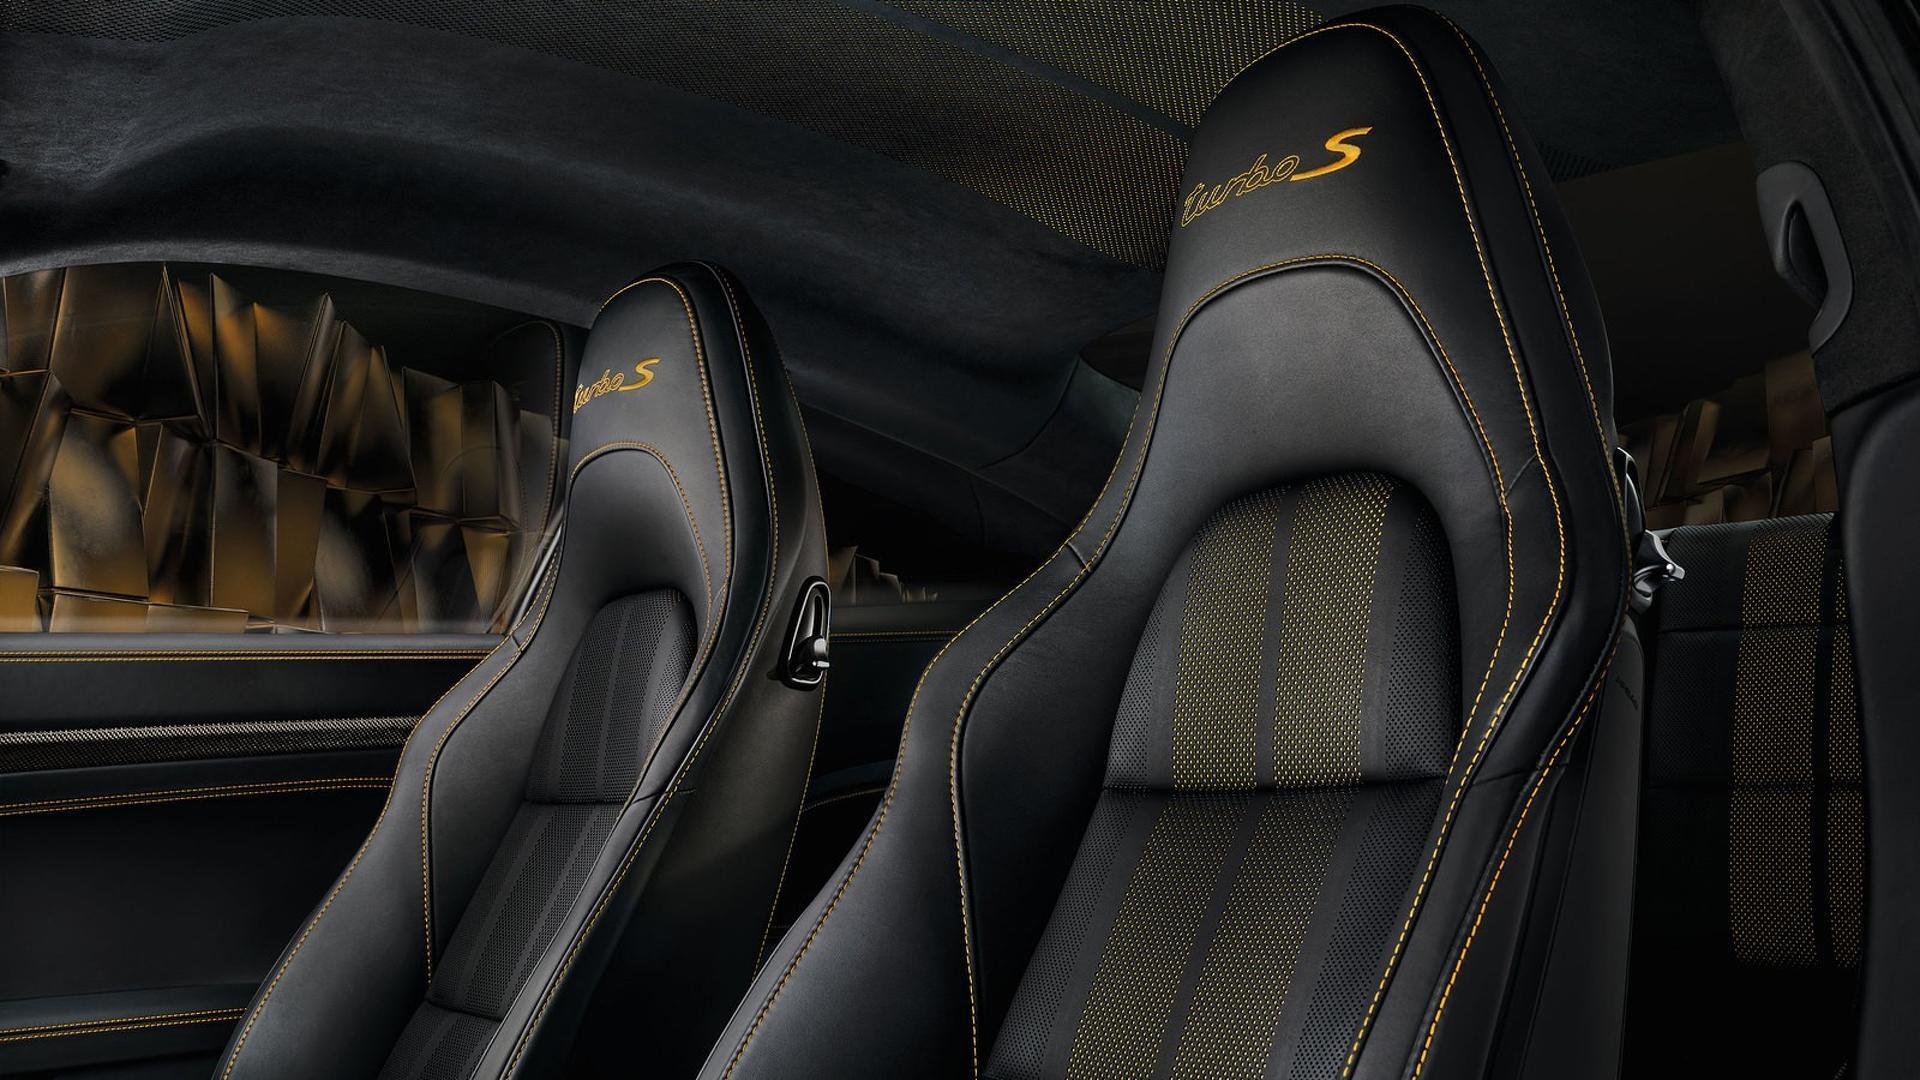 Porsche_911_Turbo_S_Exclusive_Series_28